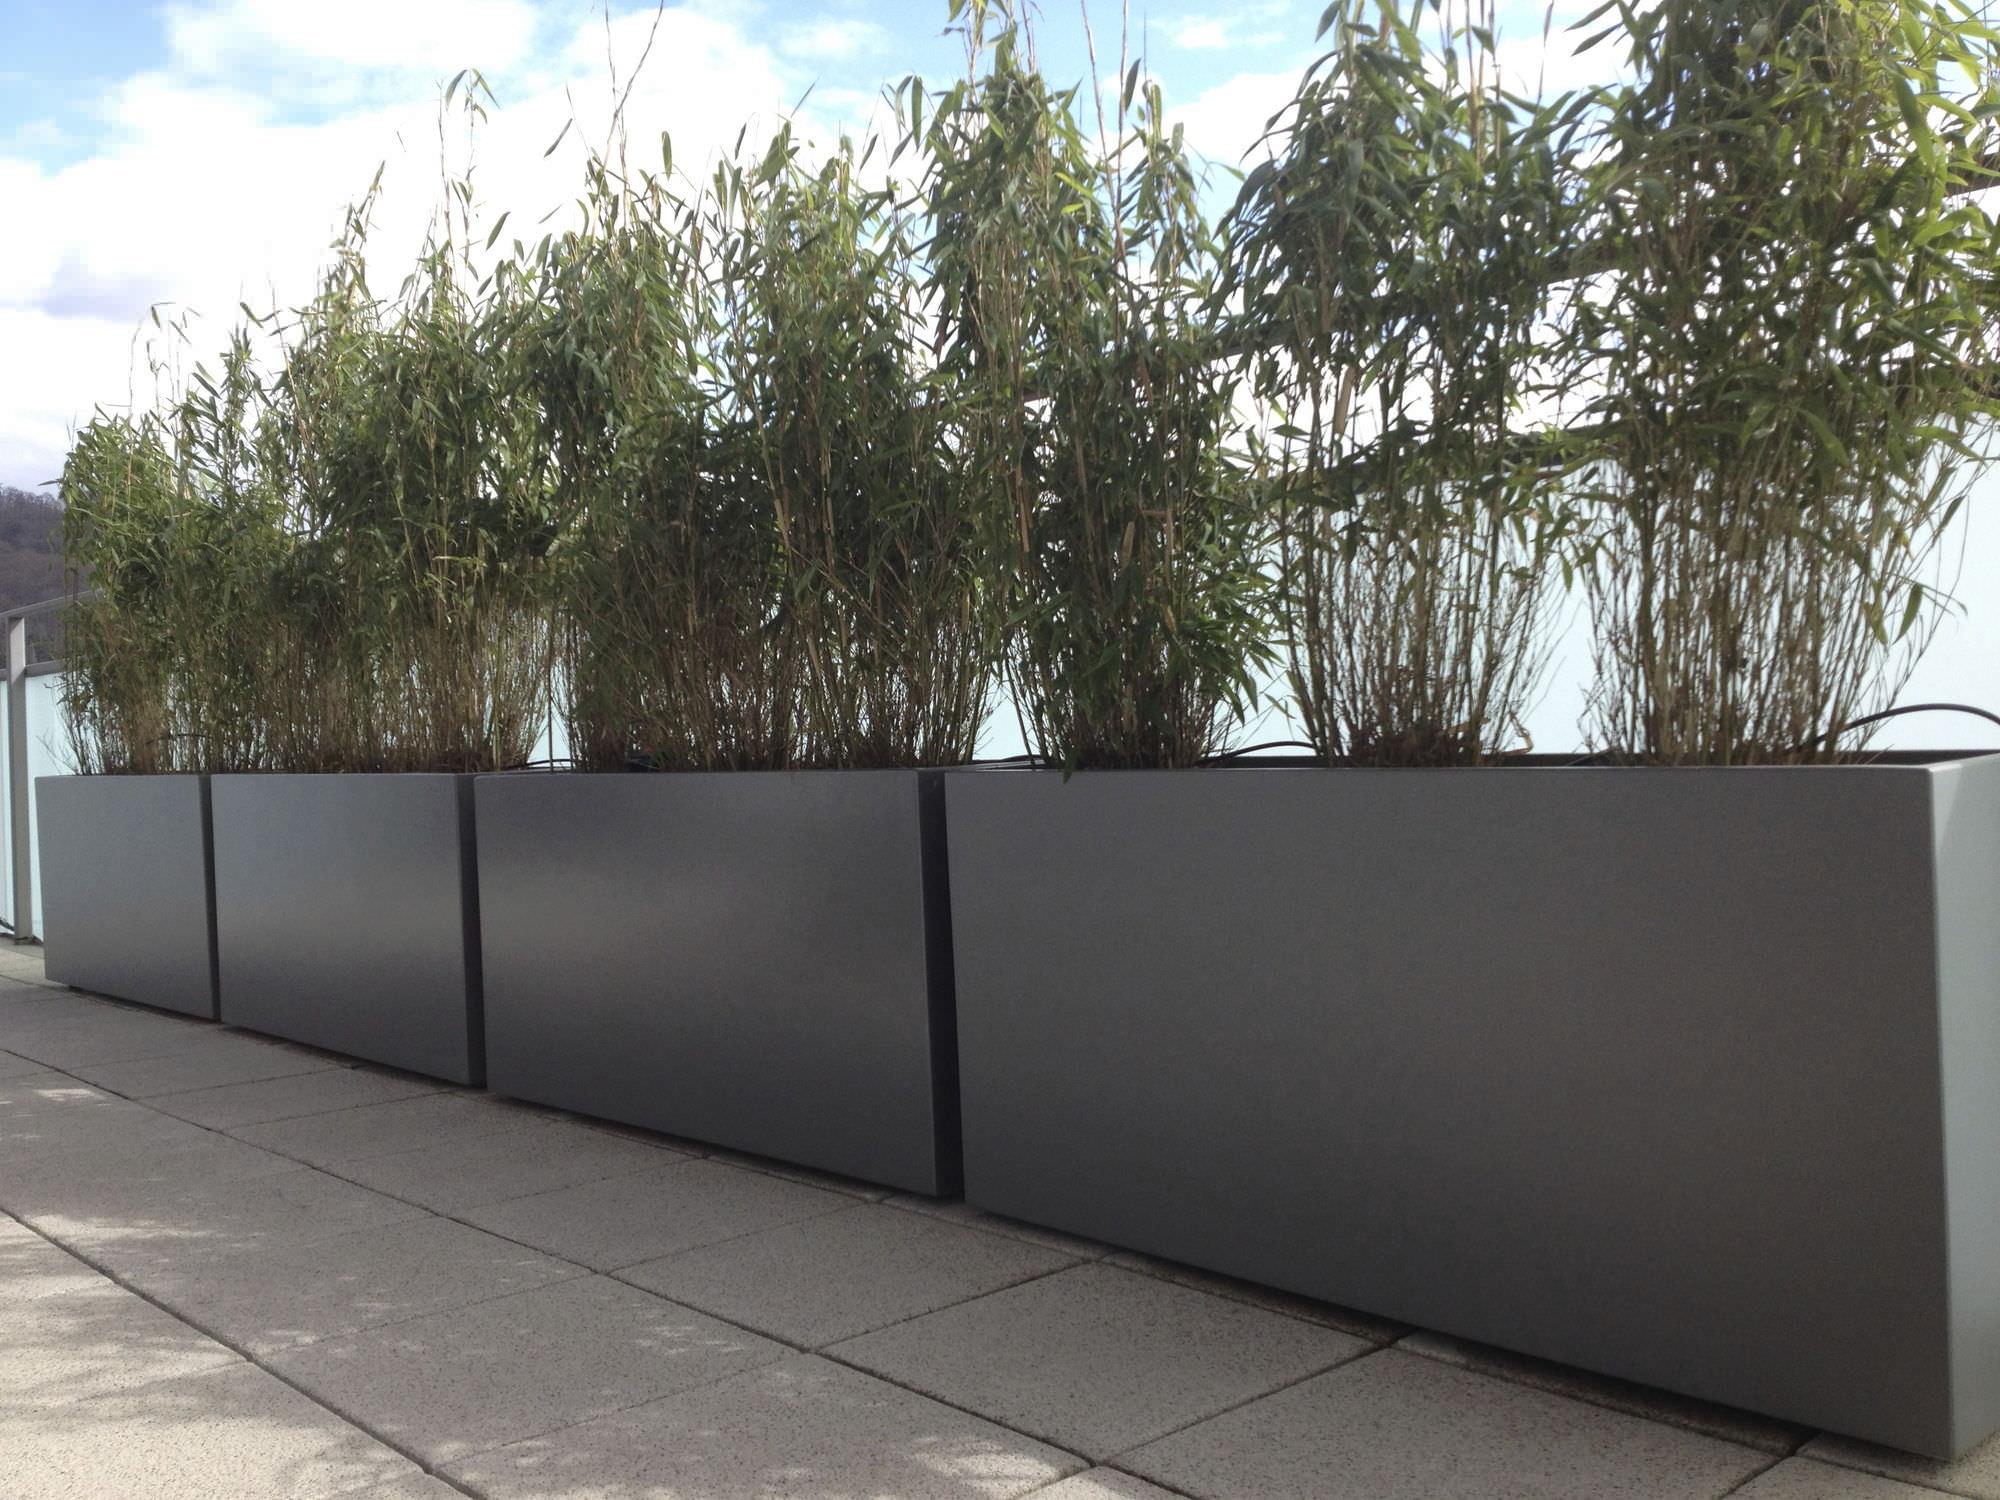 fiber cement planter  rectangular  contemporary  for public  -  fiber cement planter  rectangular  contemporary  for public areasirfh atelier so